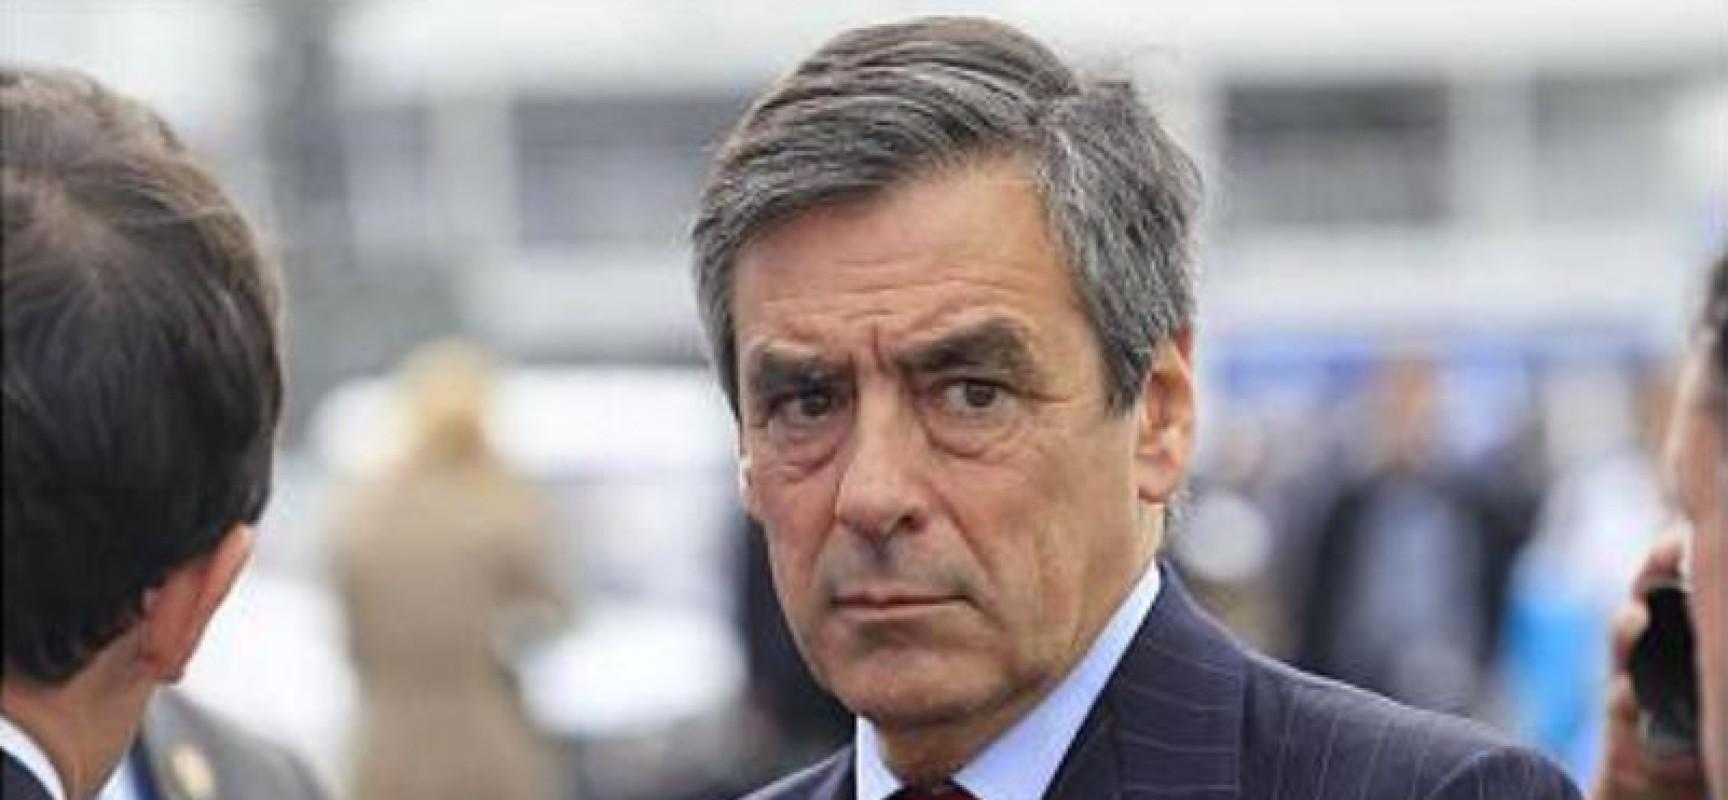 La croisade de François Fillon contre l'Islam et les barbares (Alain Gresh)